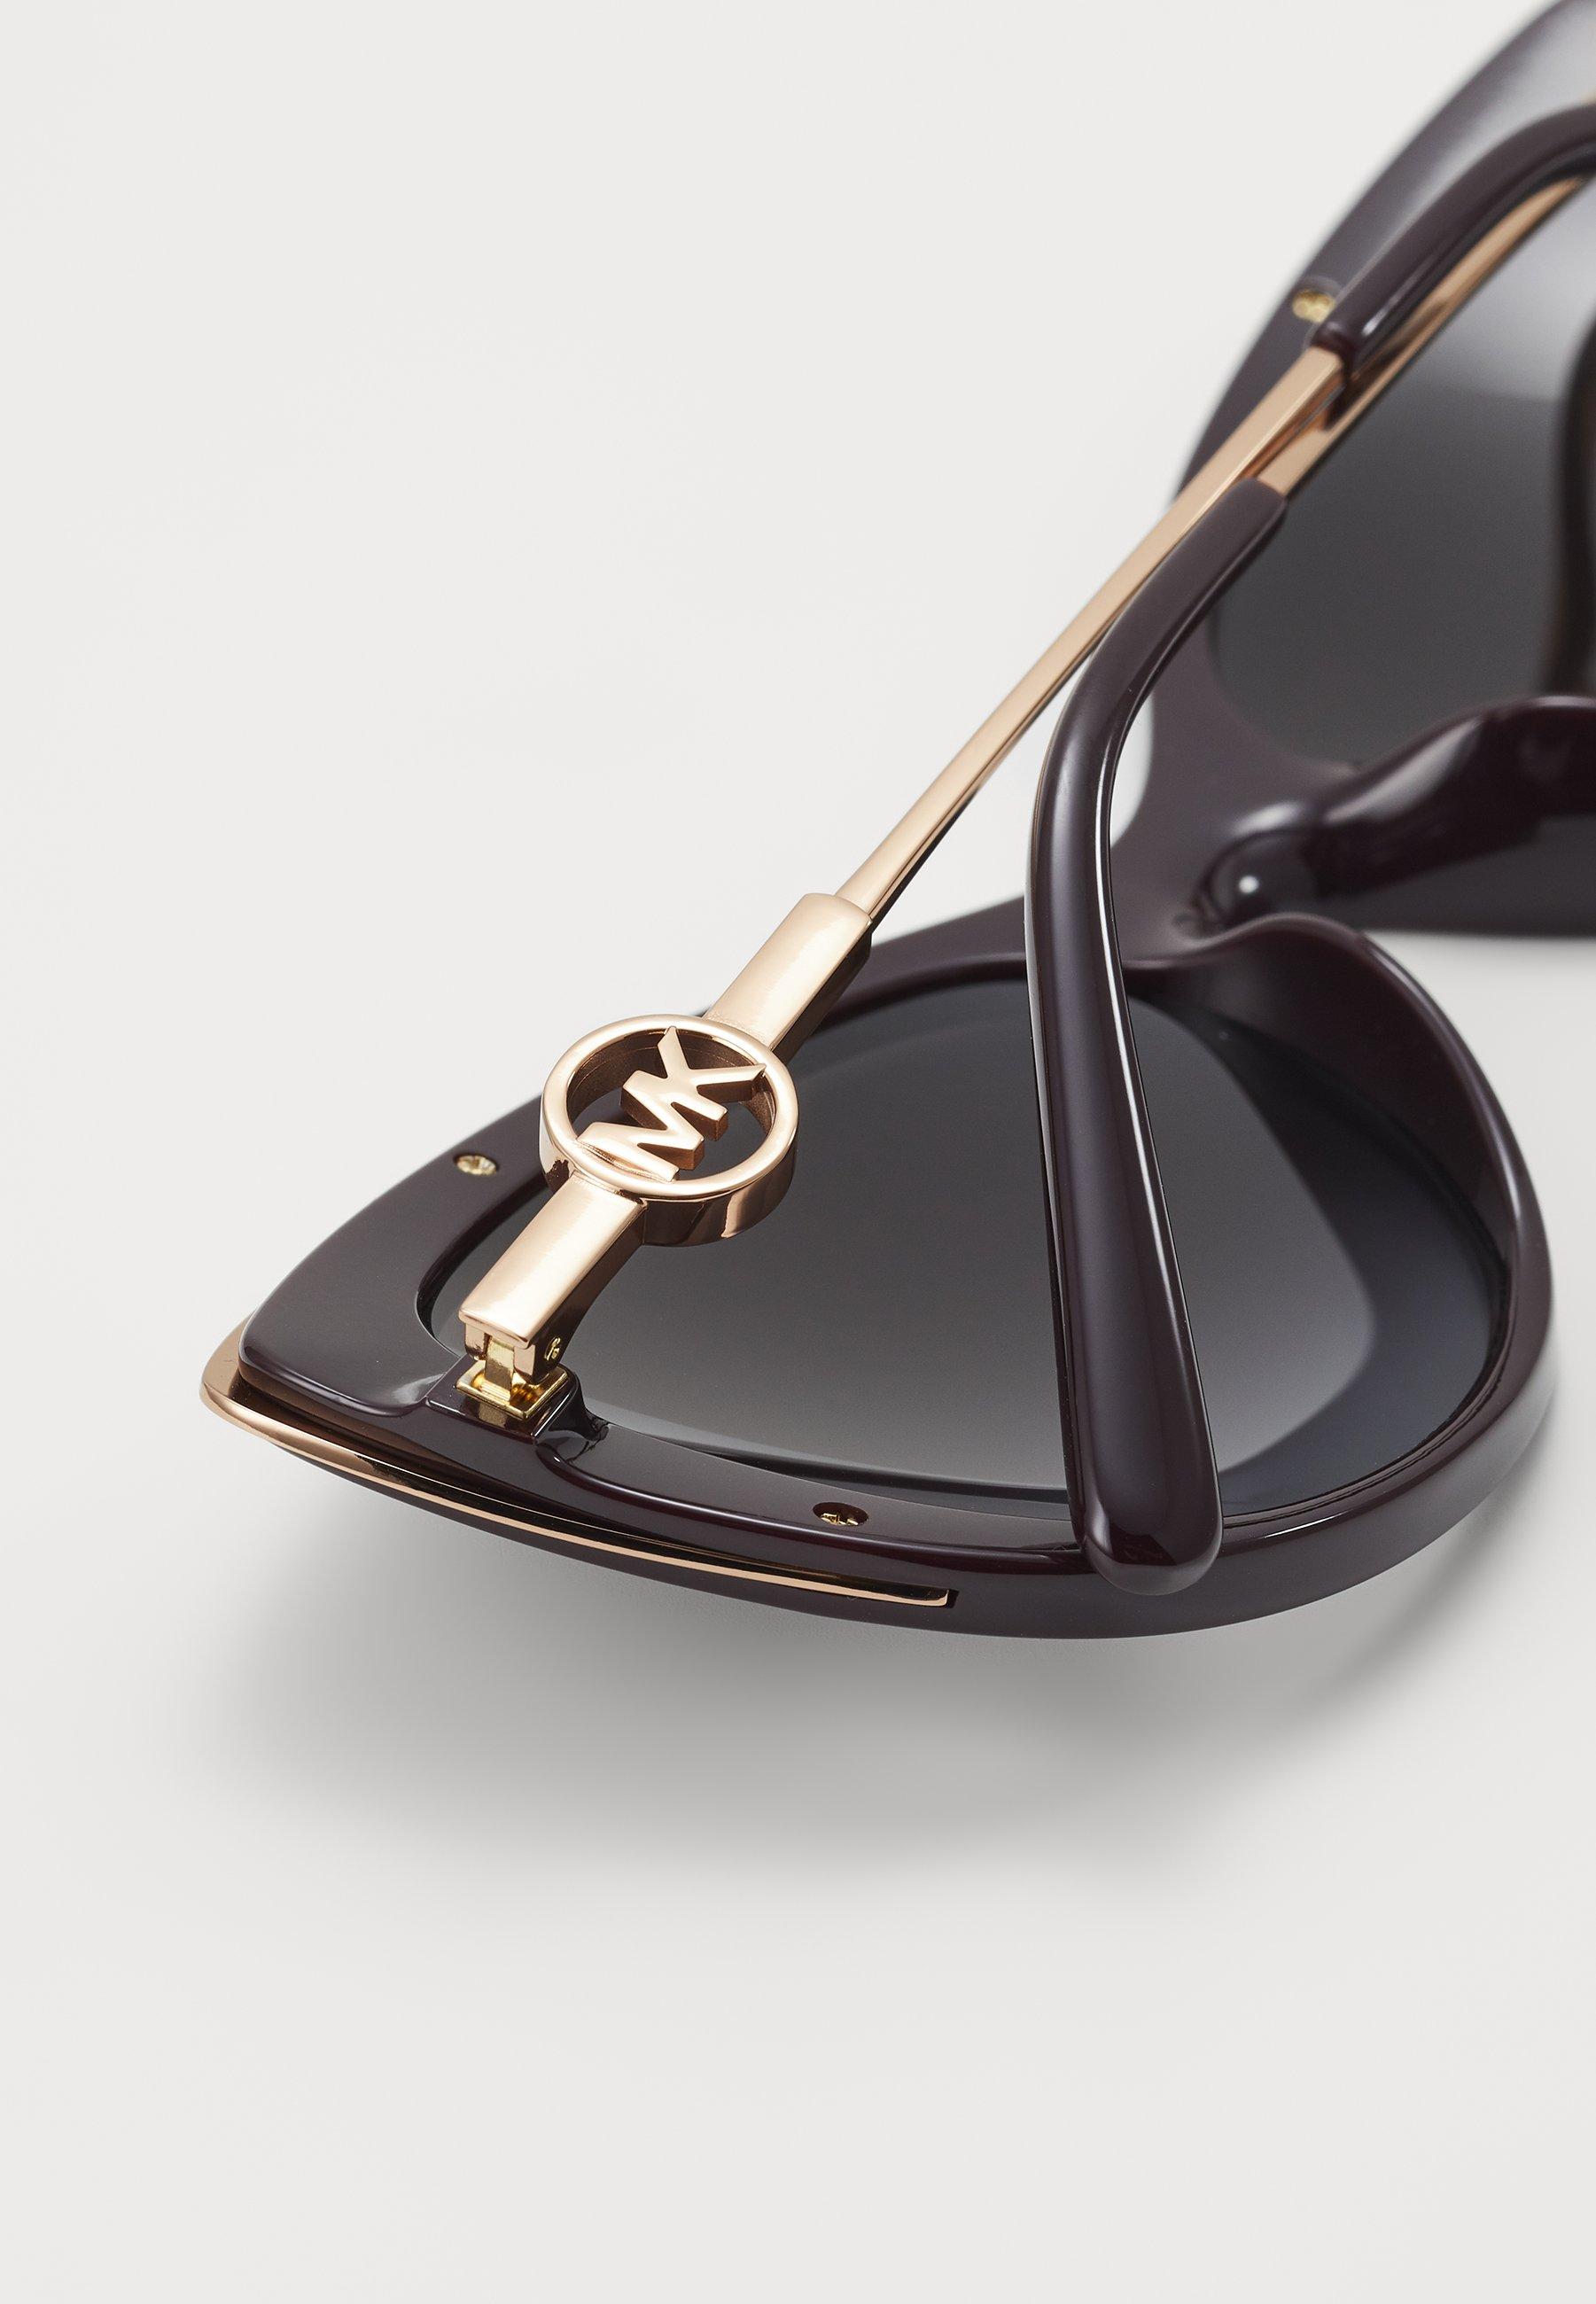 Designer Outlet Store Accessories Michael Kors SOUTH HAMPTON Sunglasses rose gold-coloured EURKK1Ej7 l3yXltGBR